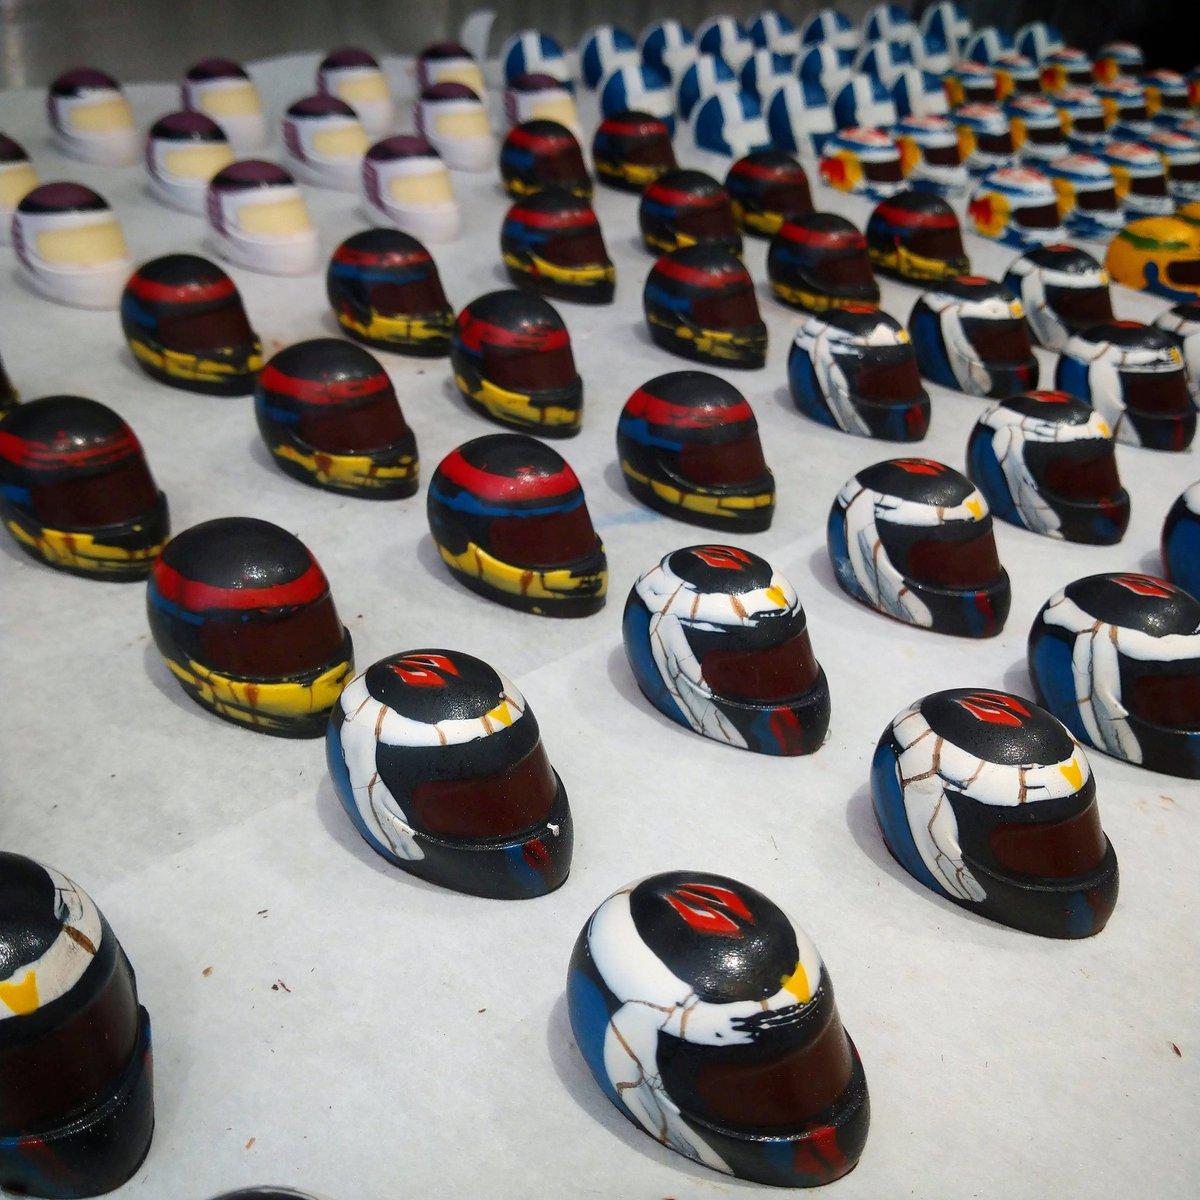 A closer look at our mint fondant and dark chocolate #kimiraikkonen inspired racing helmet. One of my favourites. #racingchocs #chocolate #racing #helmets #motorsport #chocolatier #f1 #formula1 #fathersday https://t.co/ldUY9TONqq